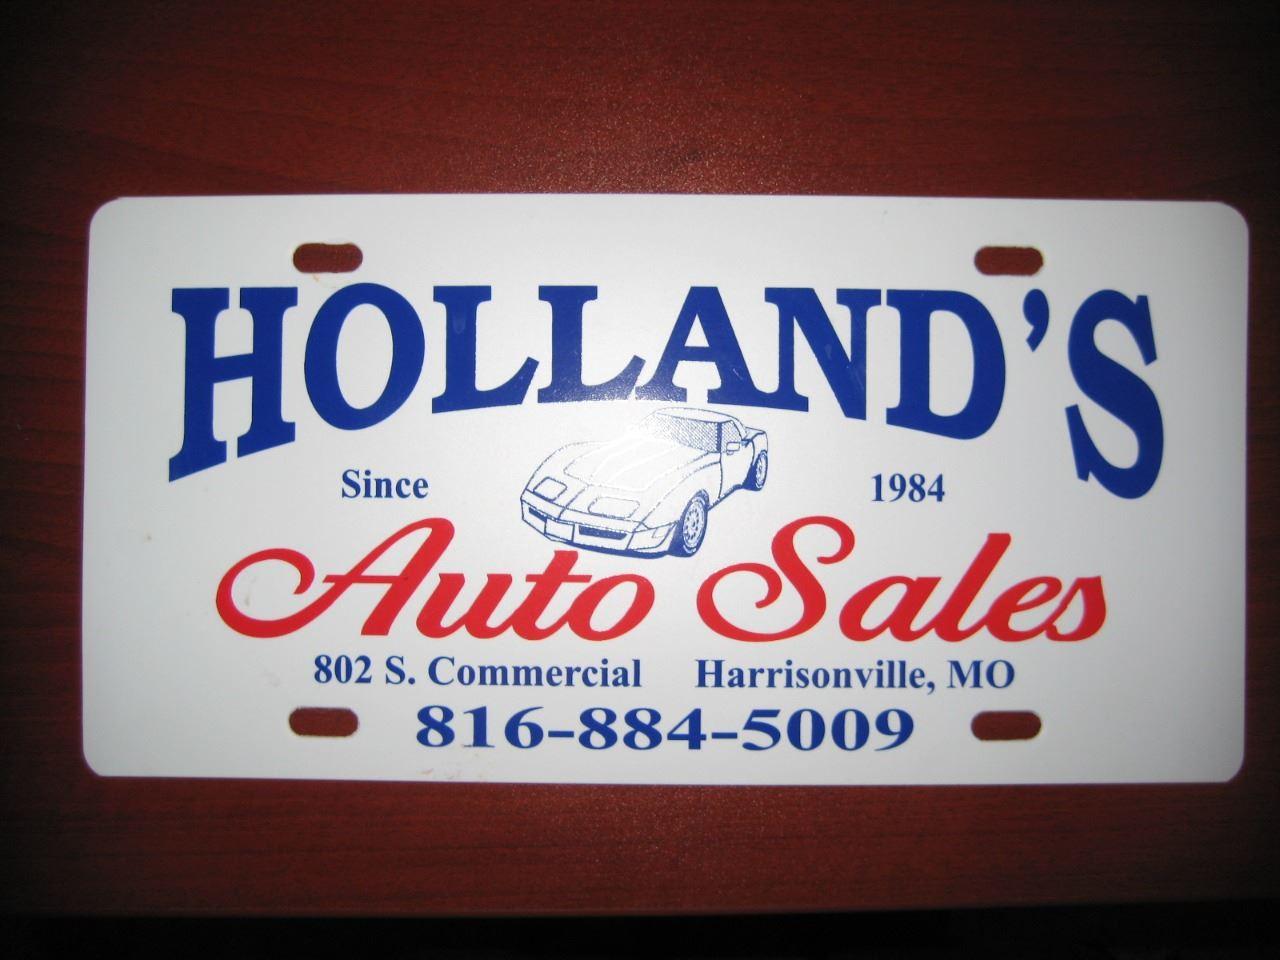 Holland's Auto Sales